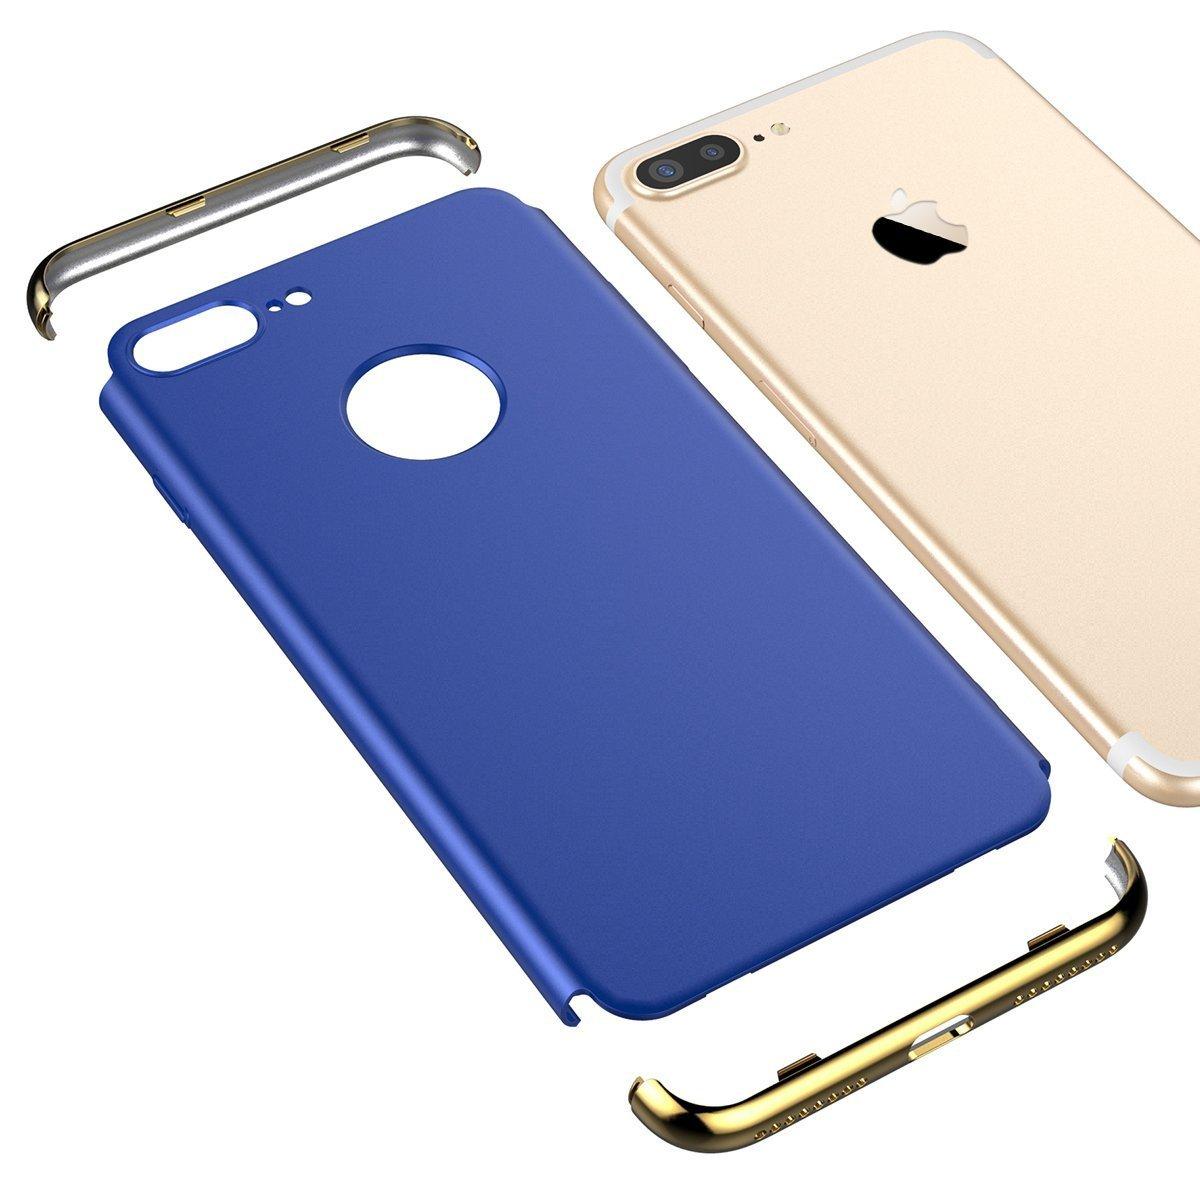 VemMore iPhone 8 Plus Hülle Hard Case Handyhülle Ultra Slim Dünn 360 Hardcase Full Body Protection [3 in 1] Bumper Schutz Schutzhülle Anti-Kratzer Elegant Protective Stoßfest Hart PC Cover - Rose Gold DRVMIP8PY171107-01